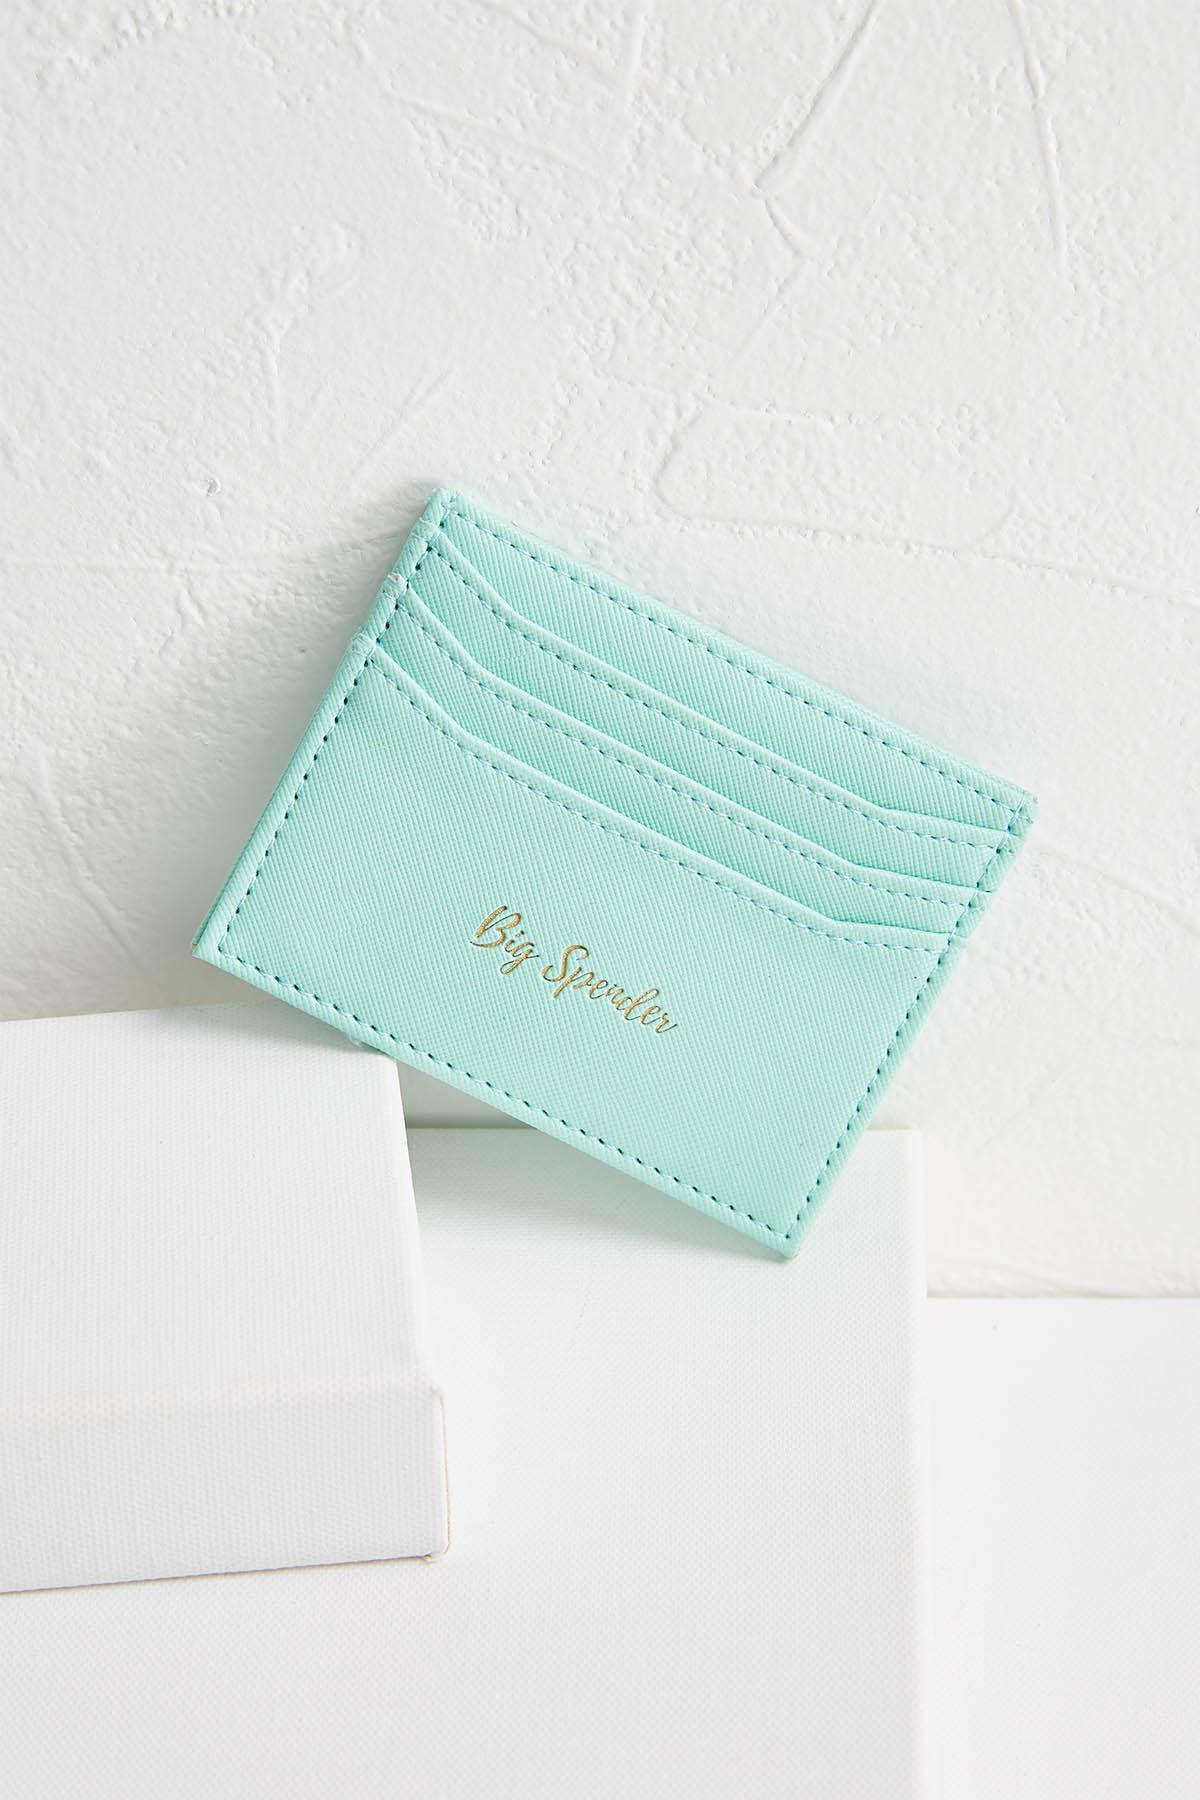 little sayings credit card holder - Card Holder